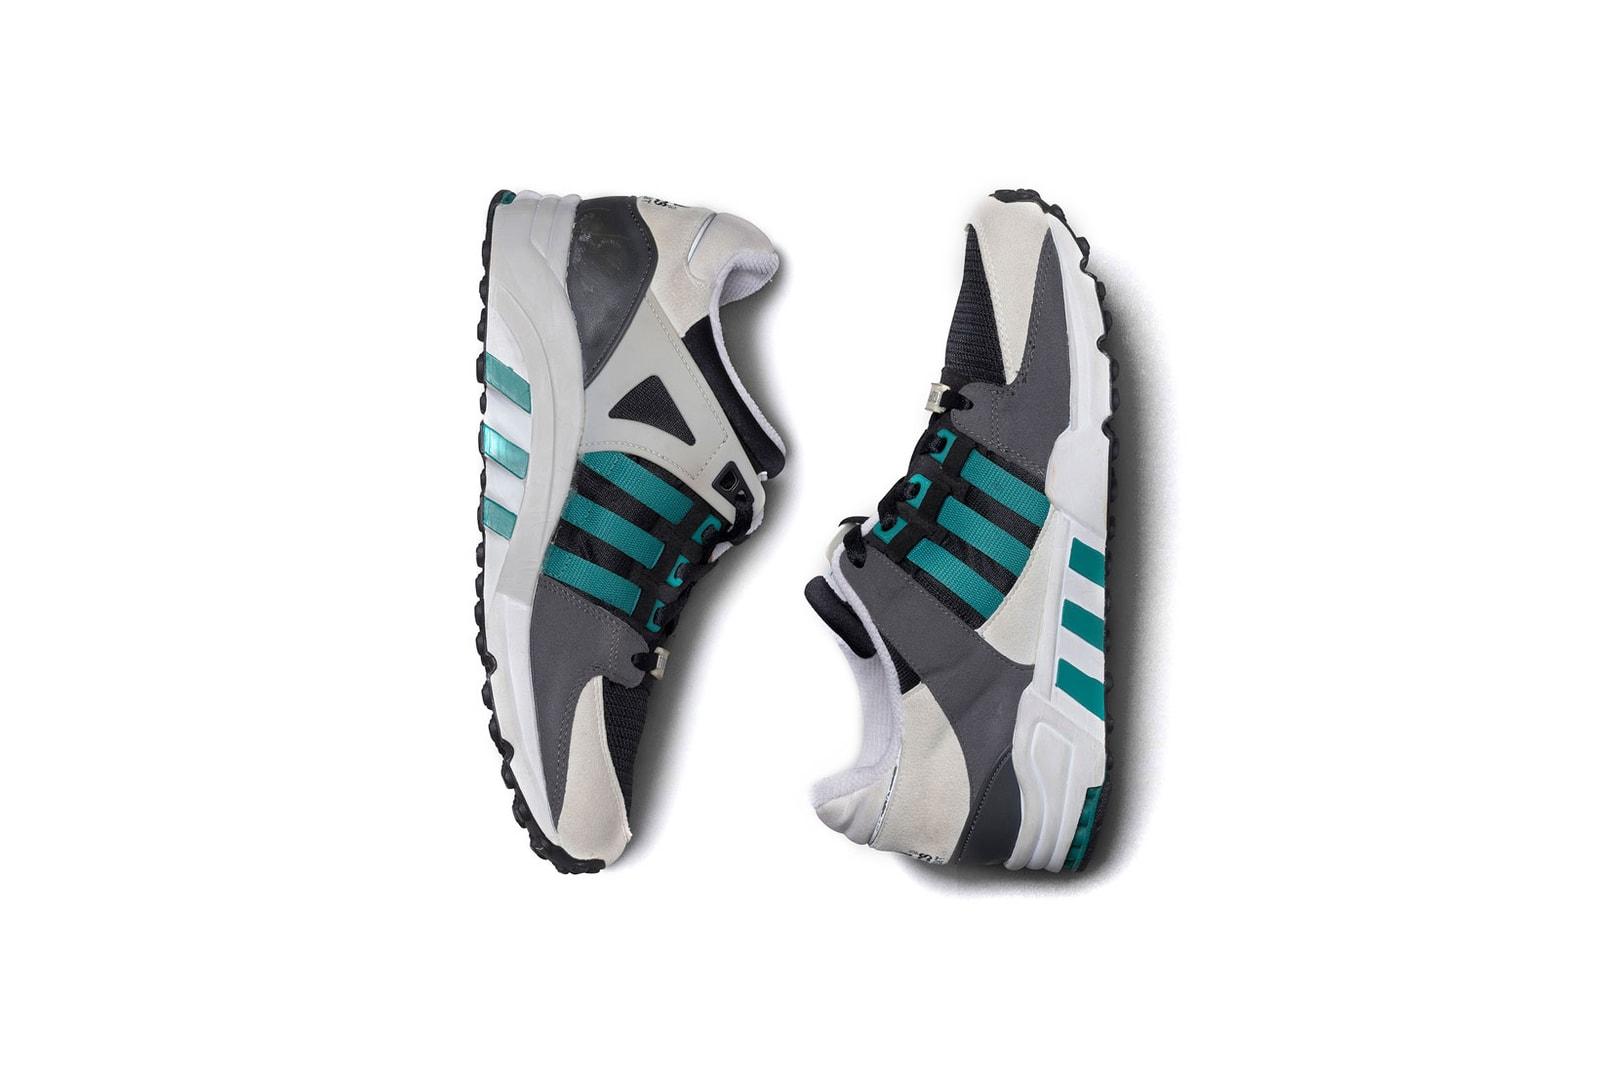 adidas Originals EQT Equipment Line Nic Galway Torben Schumacher